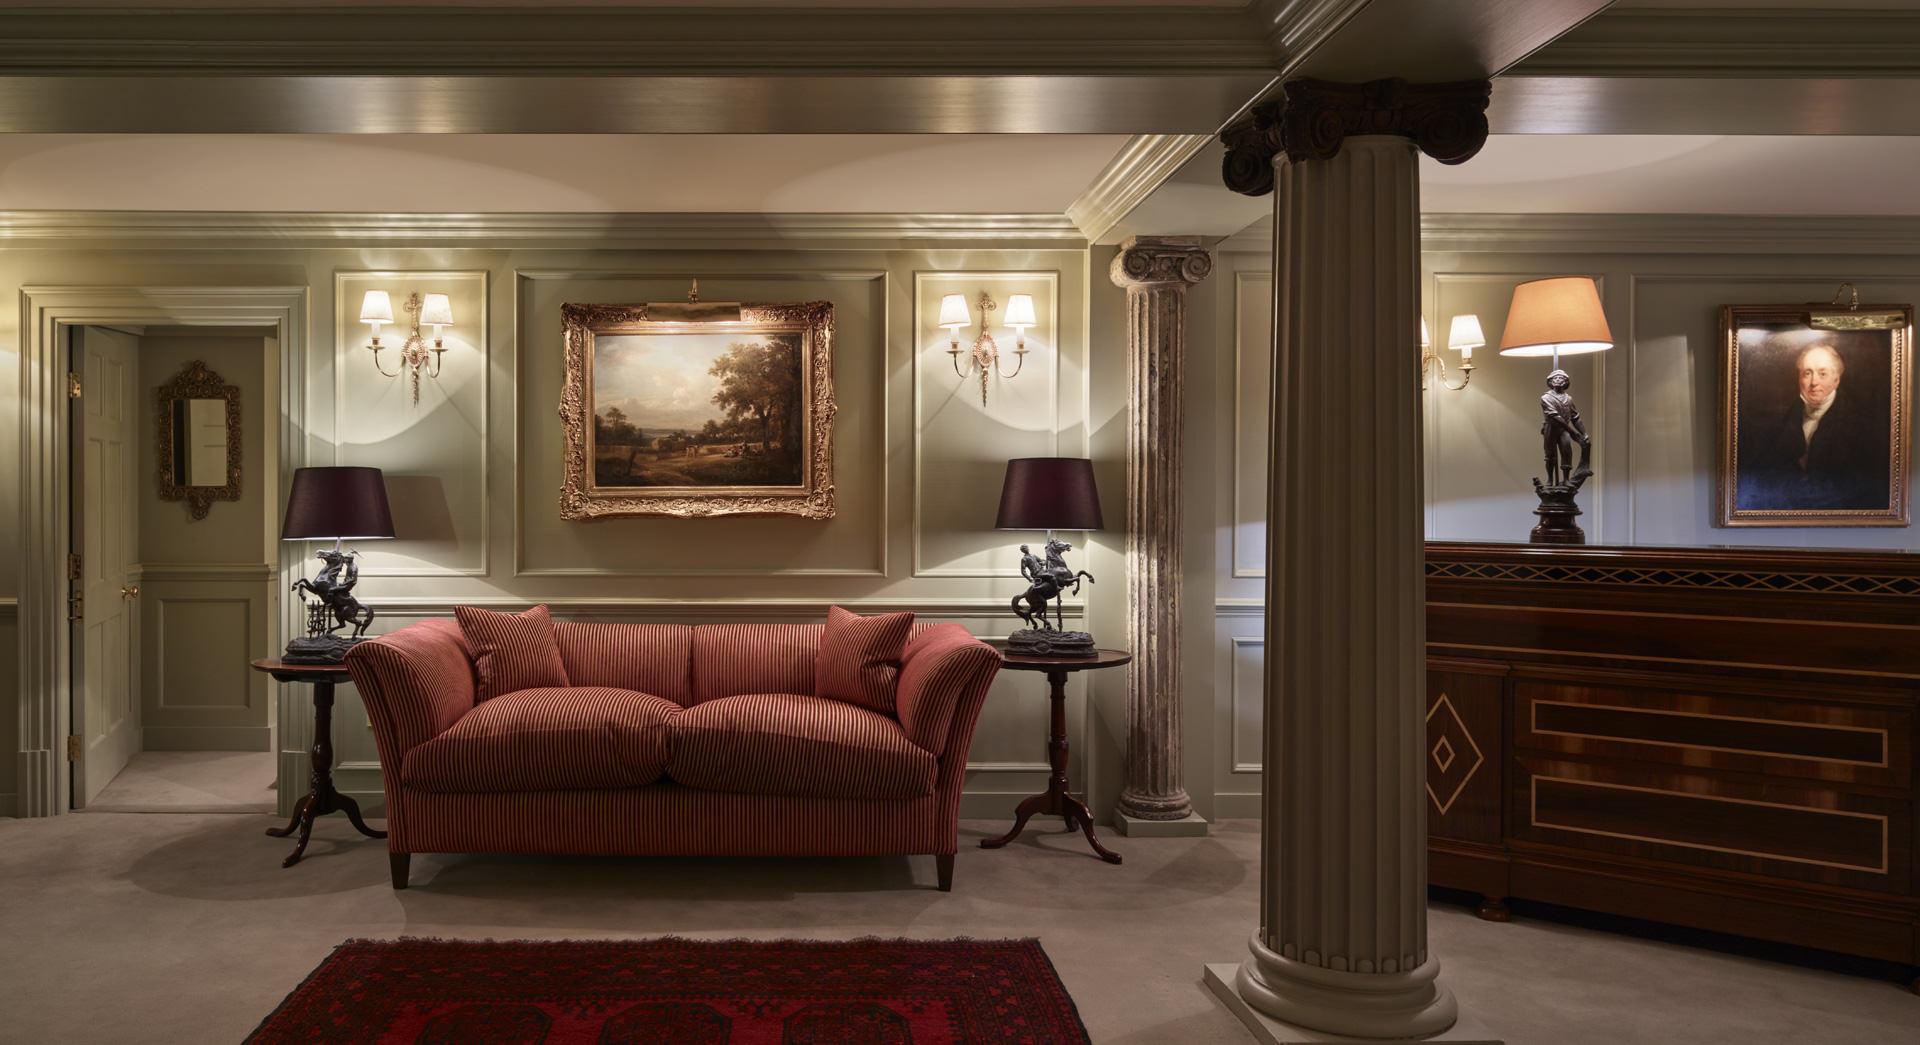 Batty Langleys Reception Area and Sofa